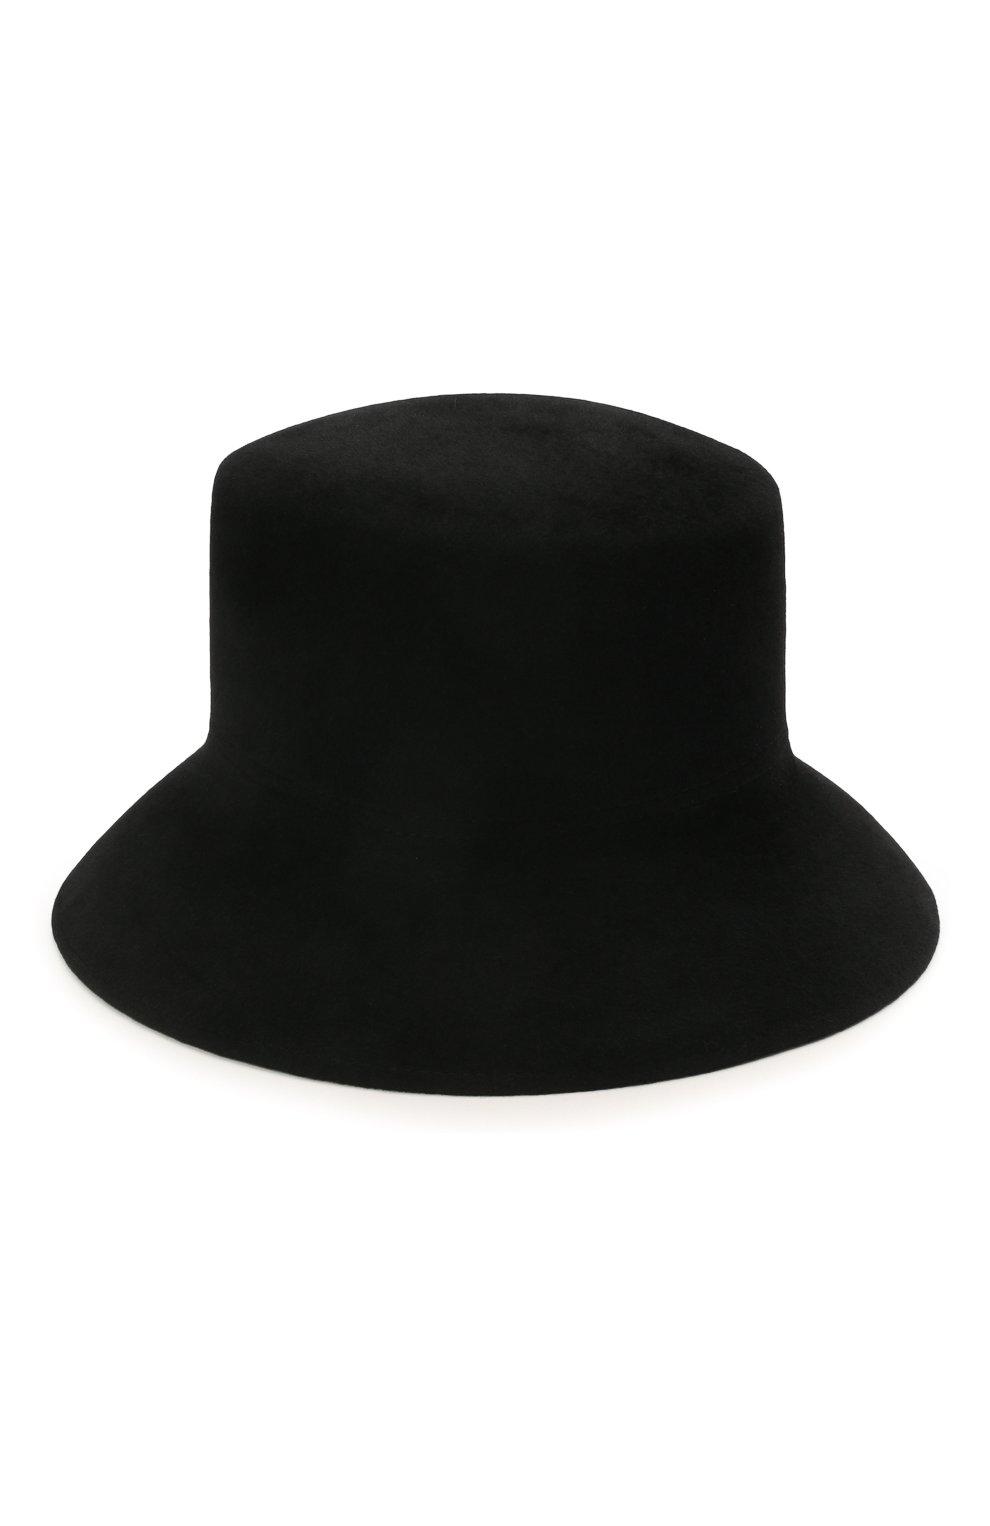 Женская шляпа panama COCOSHNICK HEADDRESS черного цвета, арт. basel-02 | Фото 2